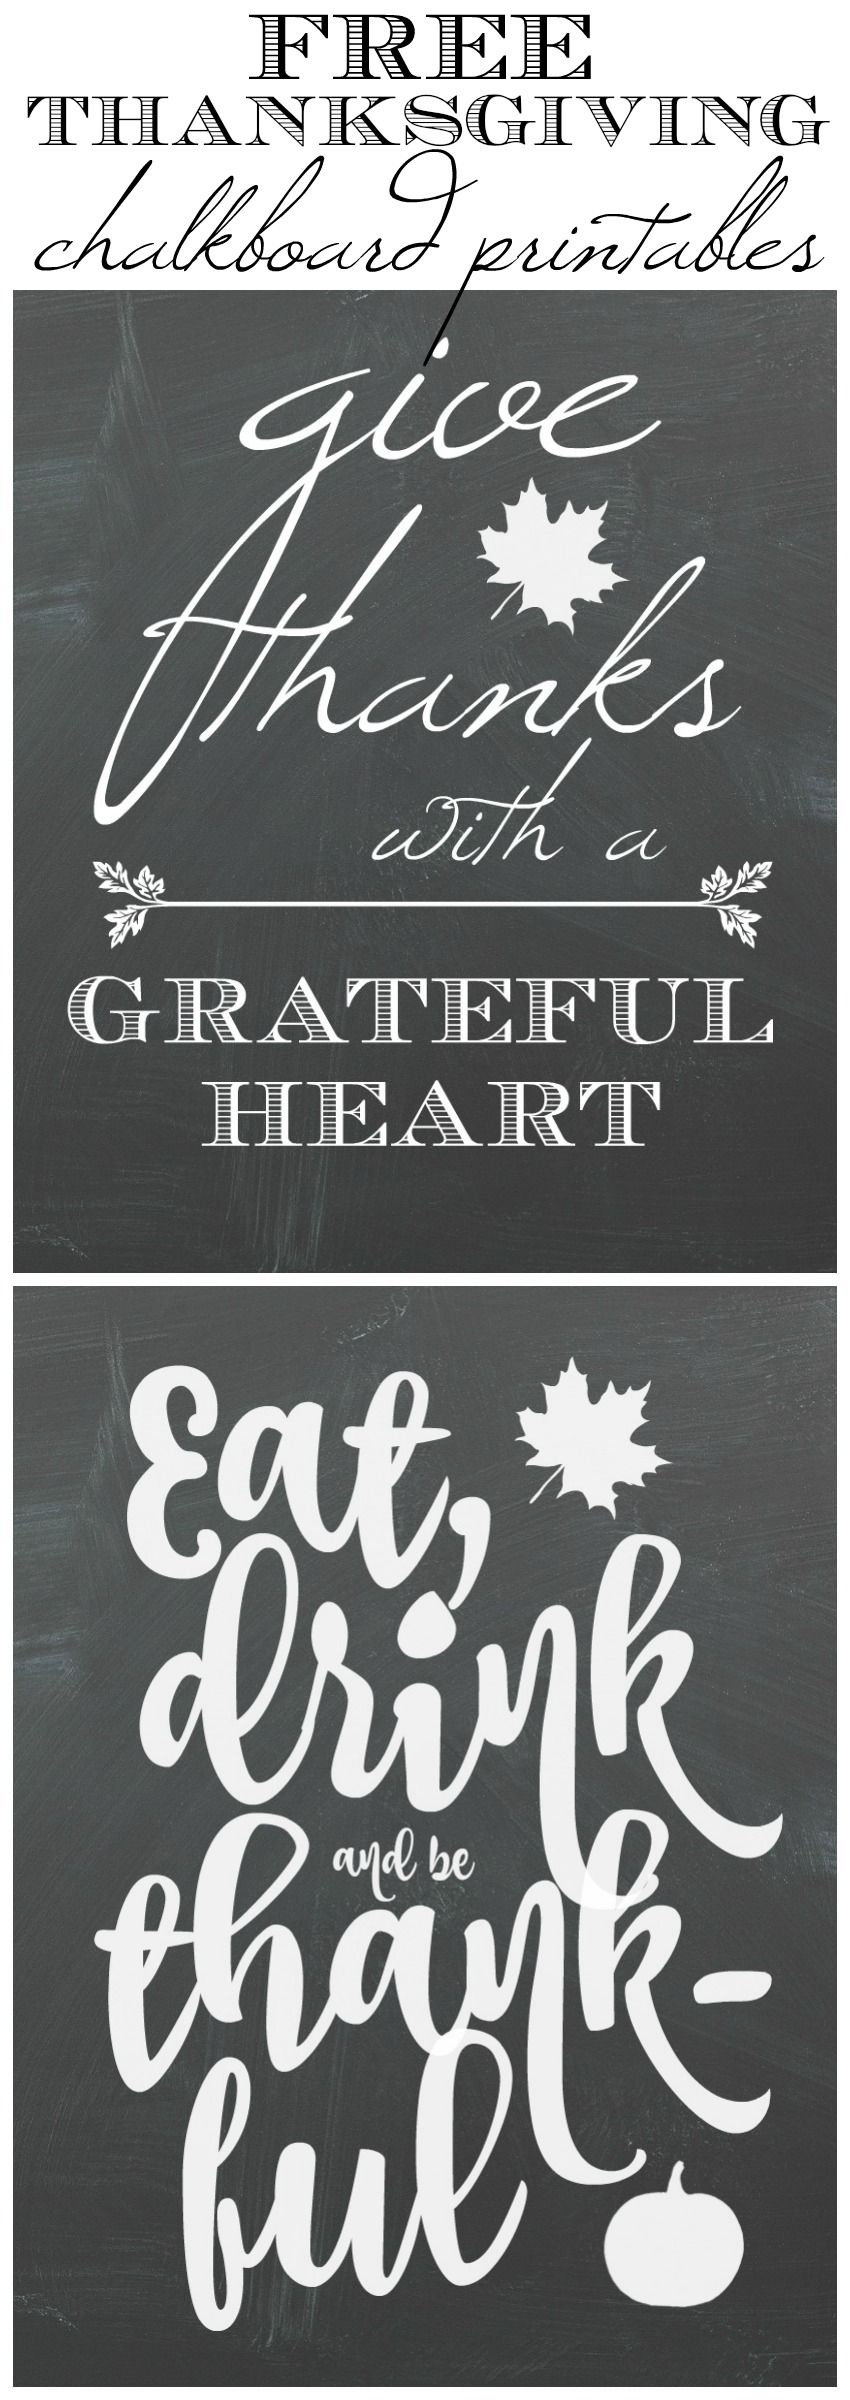 fall kitchen tour free thanksgiving chalkboard art printables